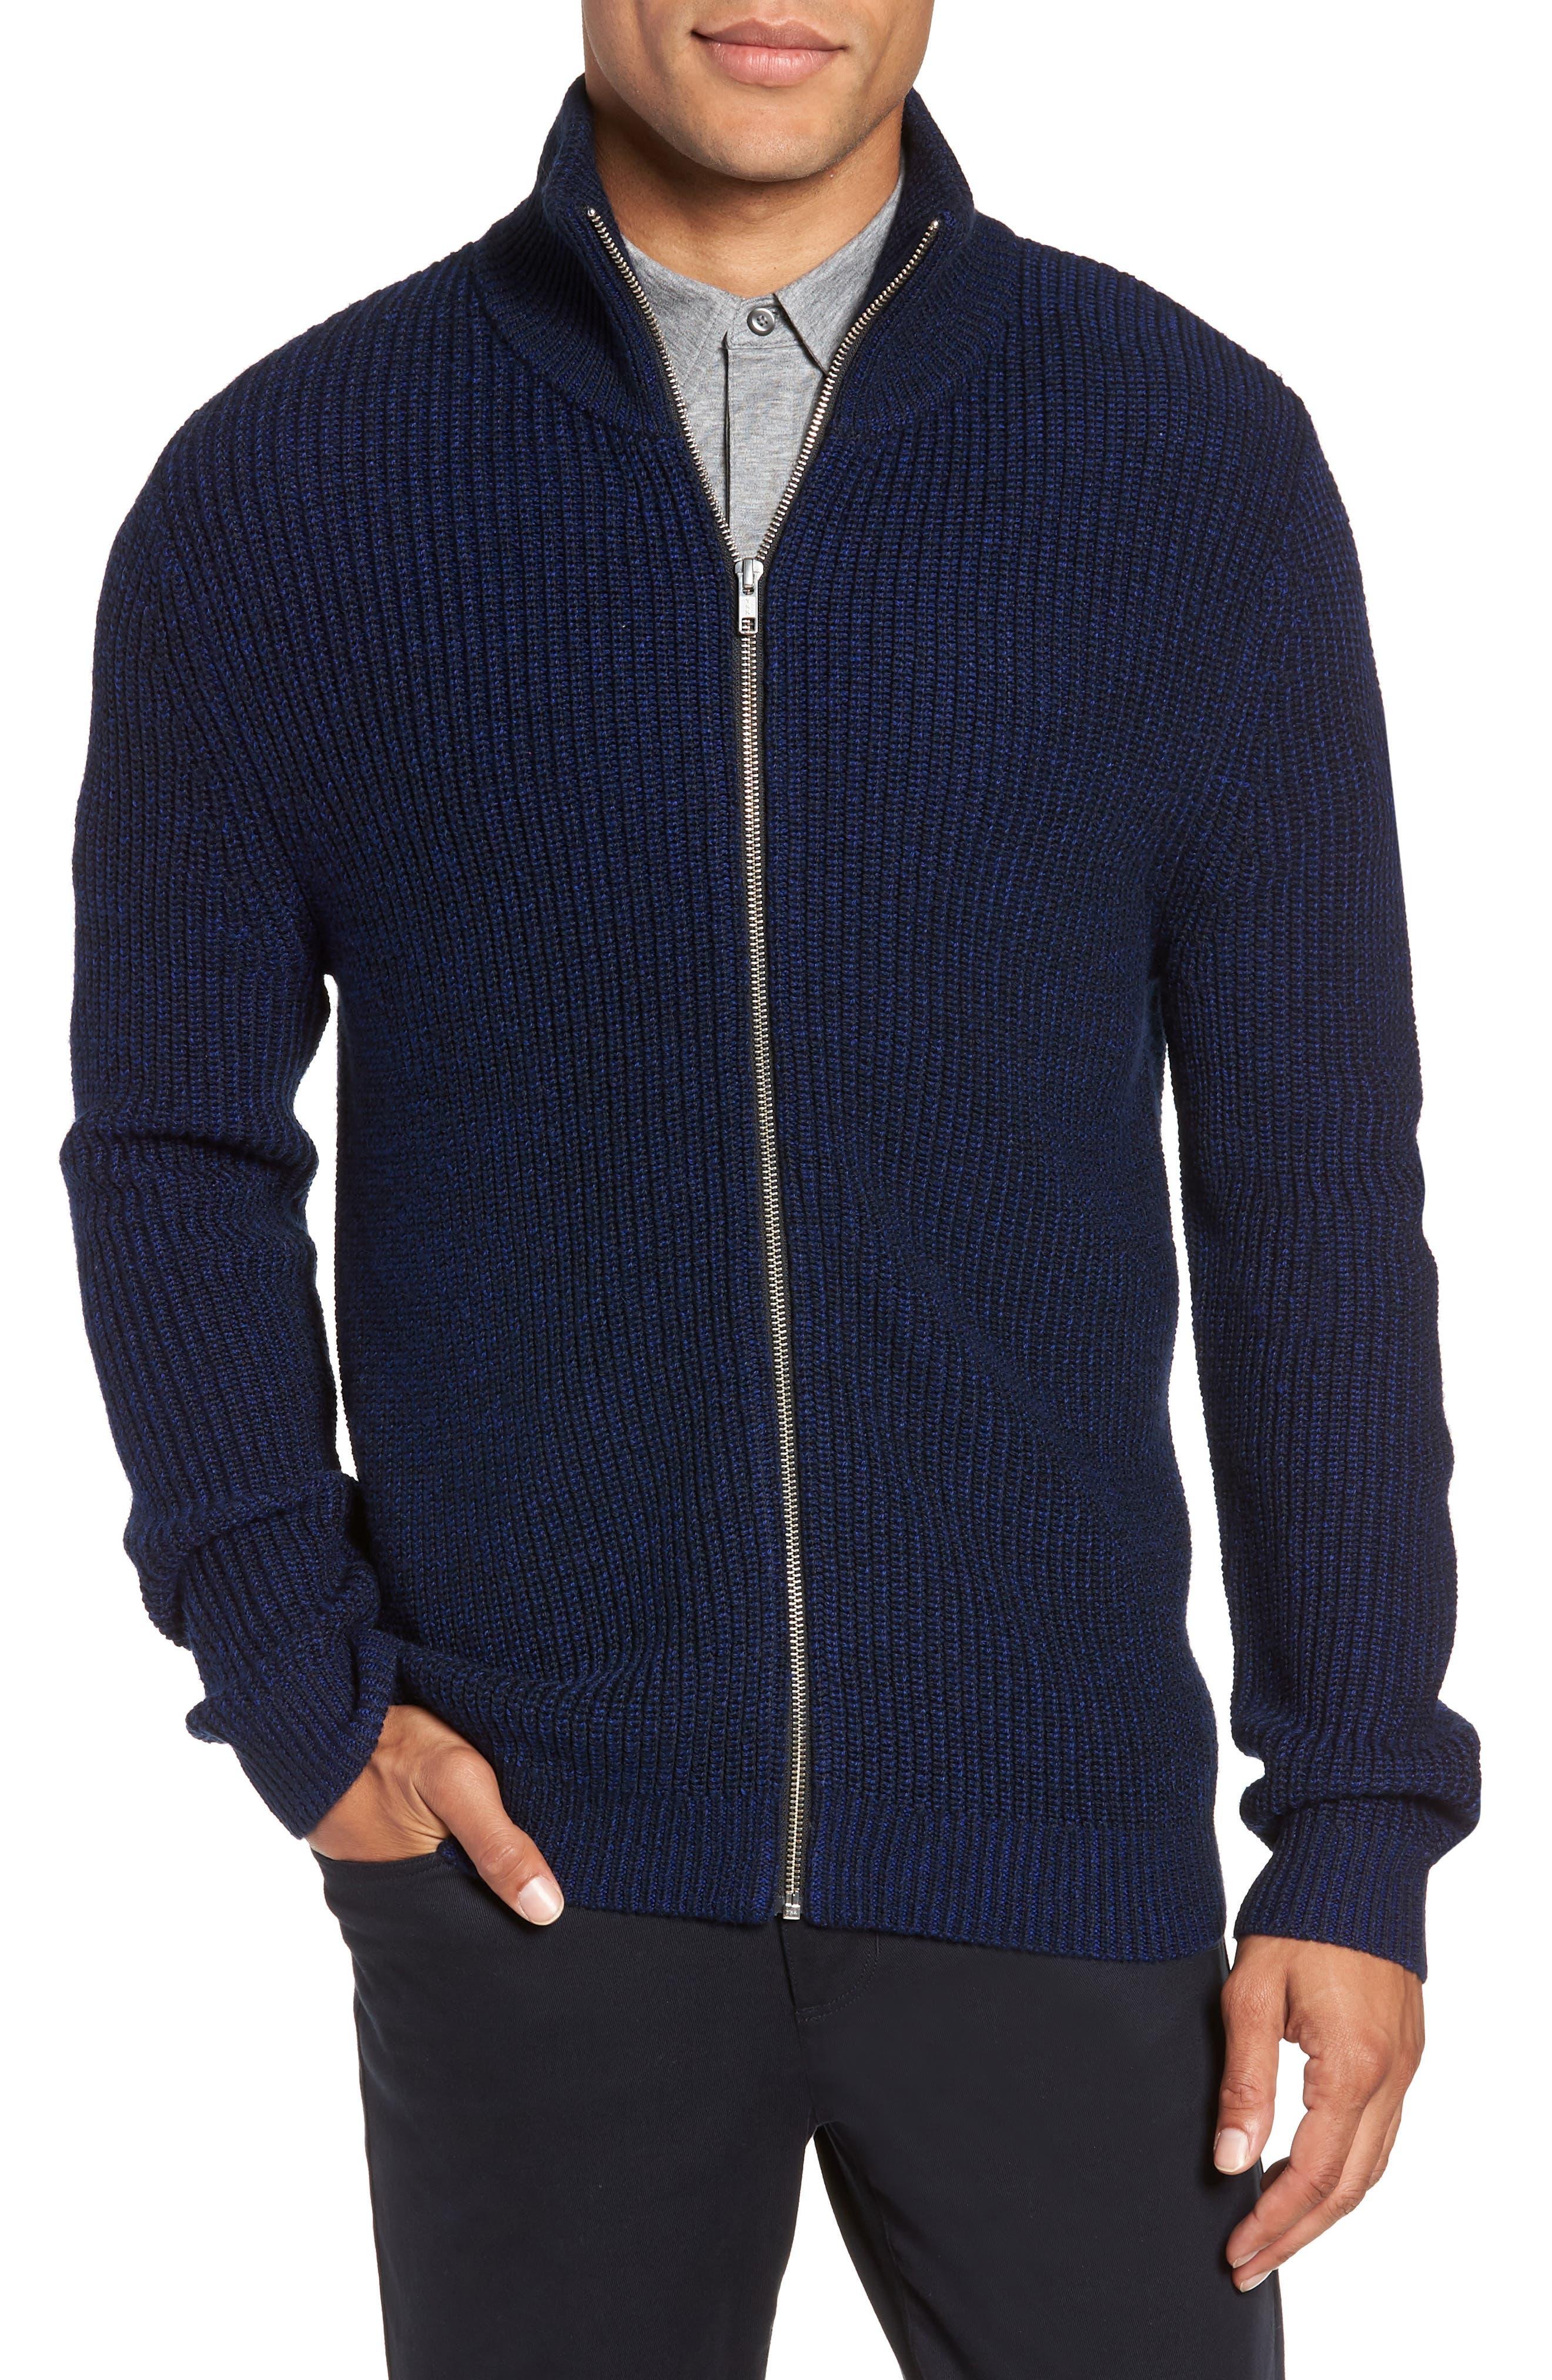 Calibrate Rib Knit Zip Sweater, Blue